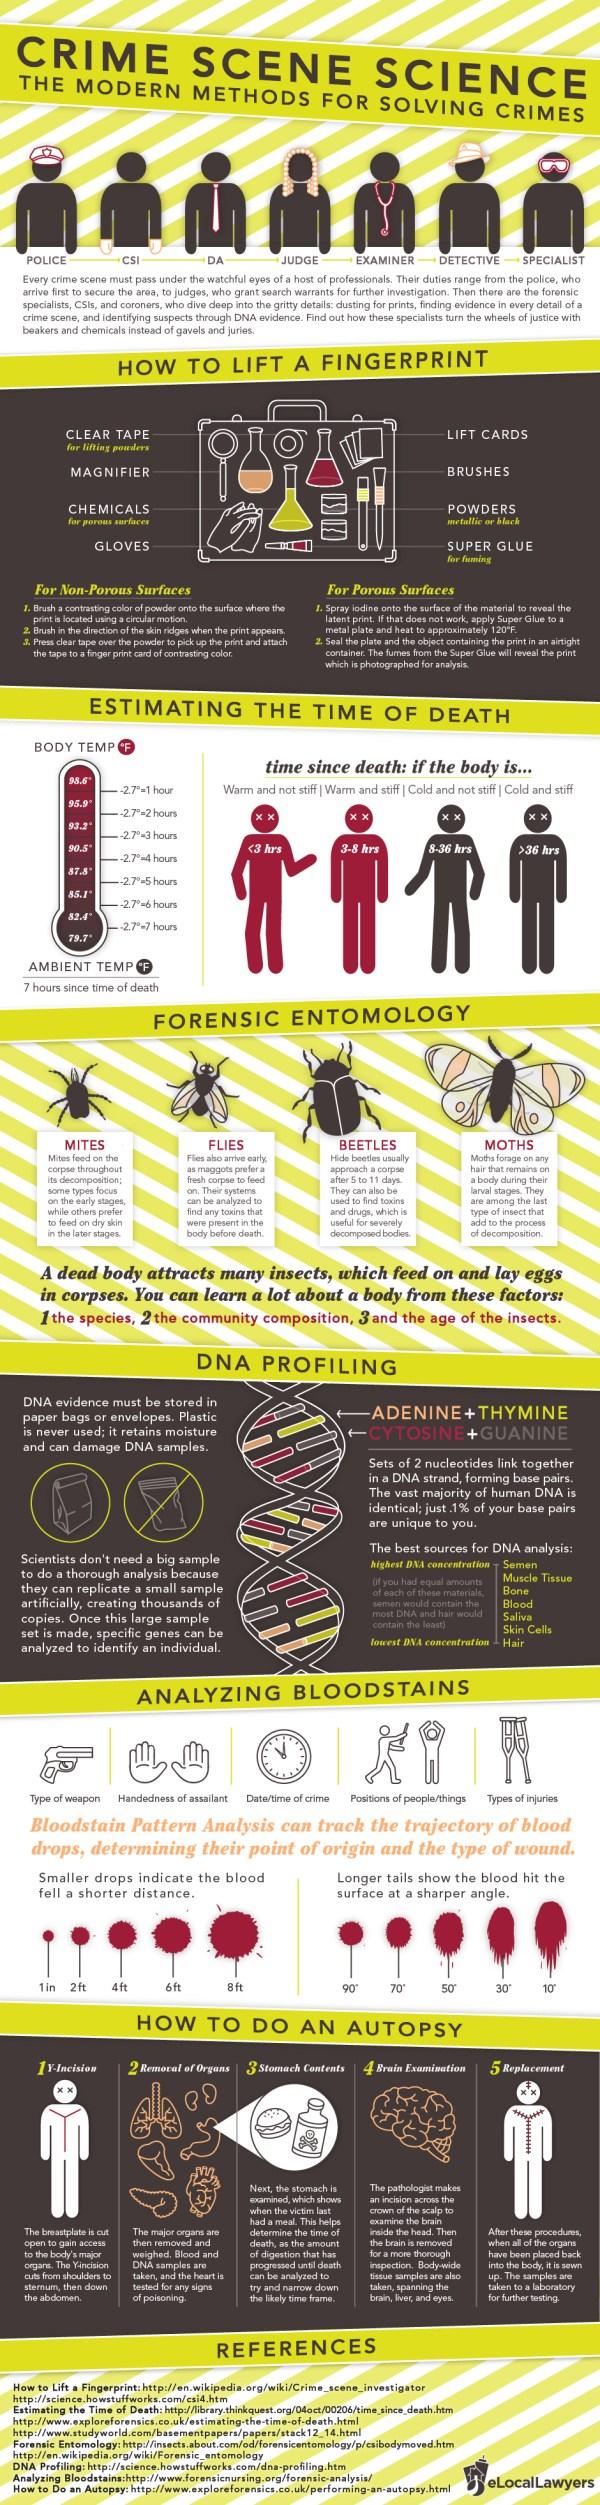 Crime Scene Science Infographic